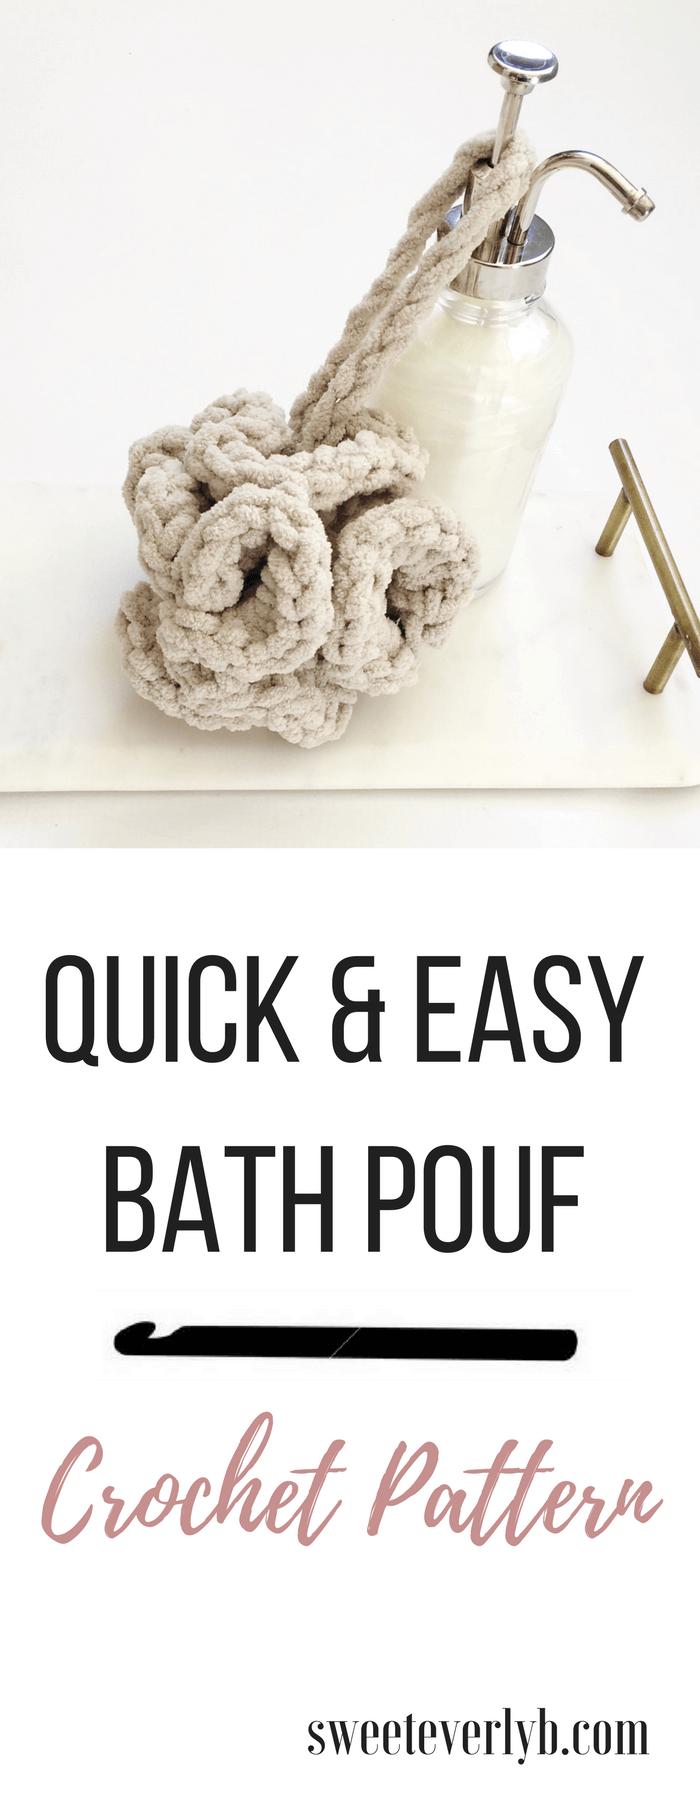 A Quick Crochet Bath Pouf Pattern That Makes A Great Diy Gift